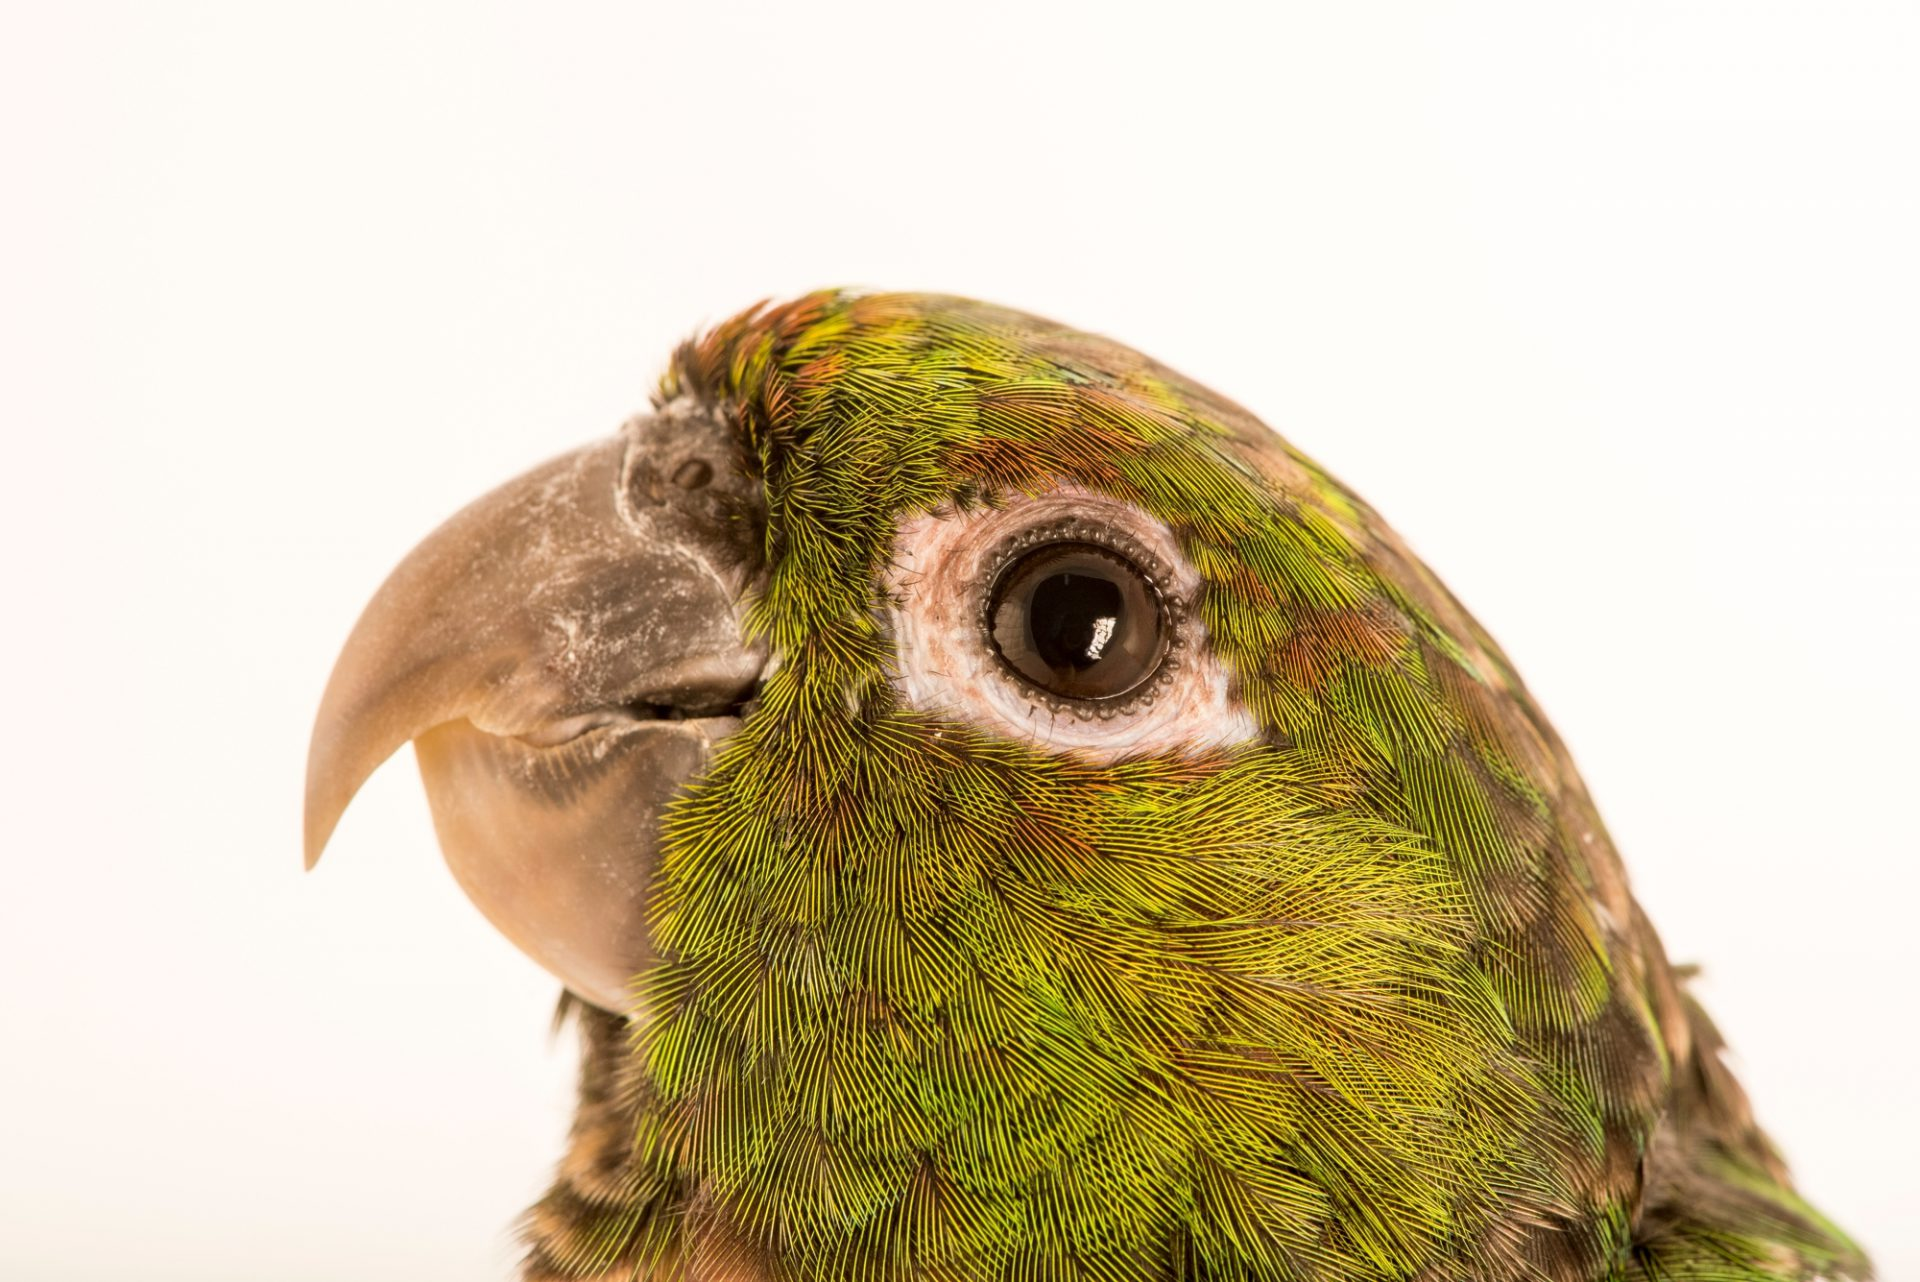 Photo: A choco parakeet (Pyrrhura pacifica) at Loro Parque Fundacion.